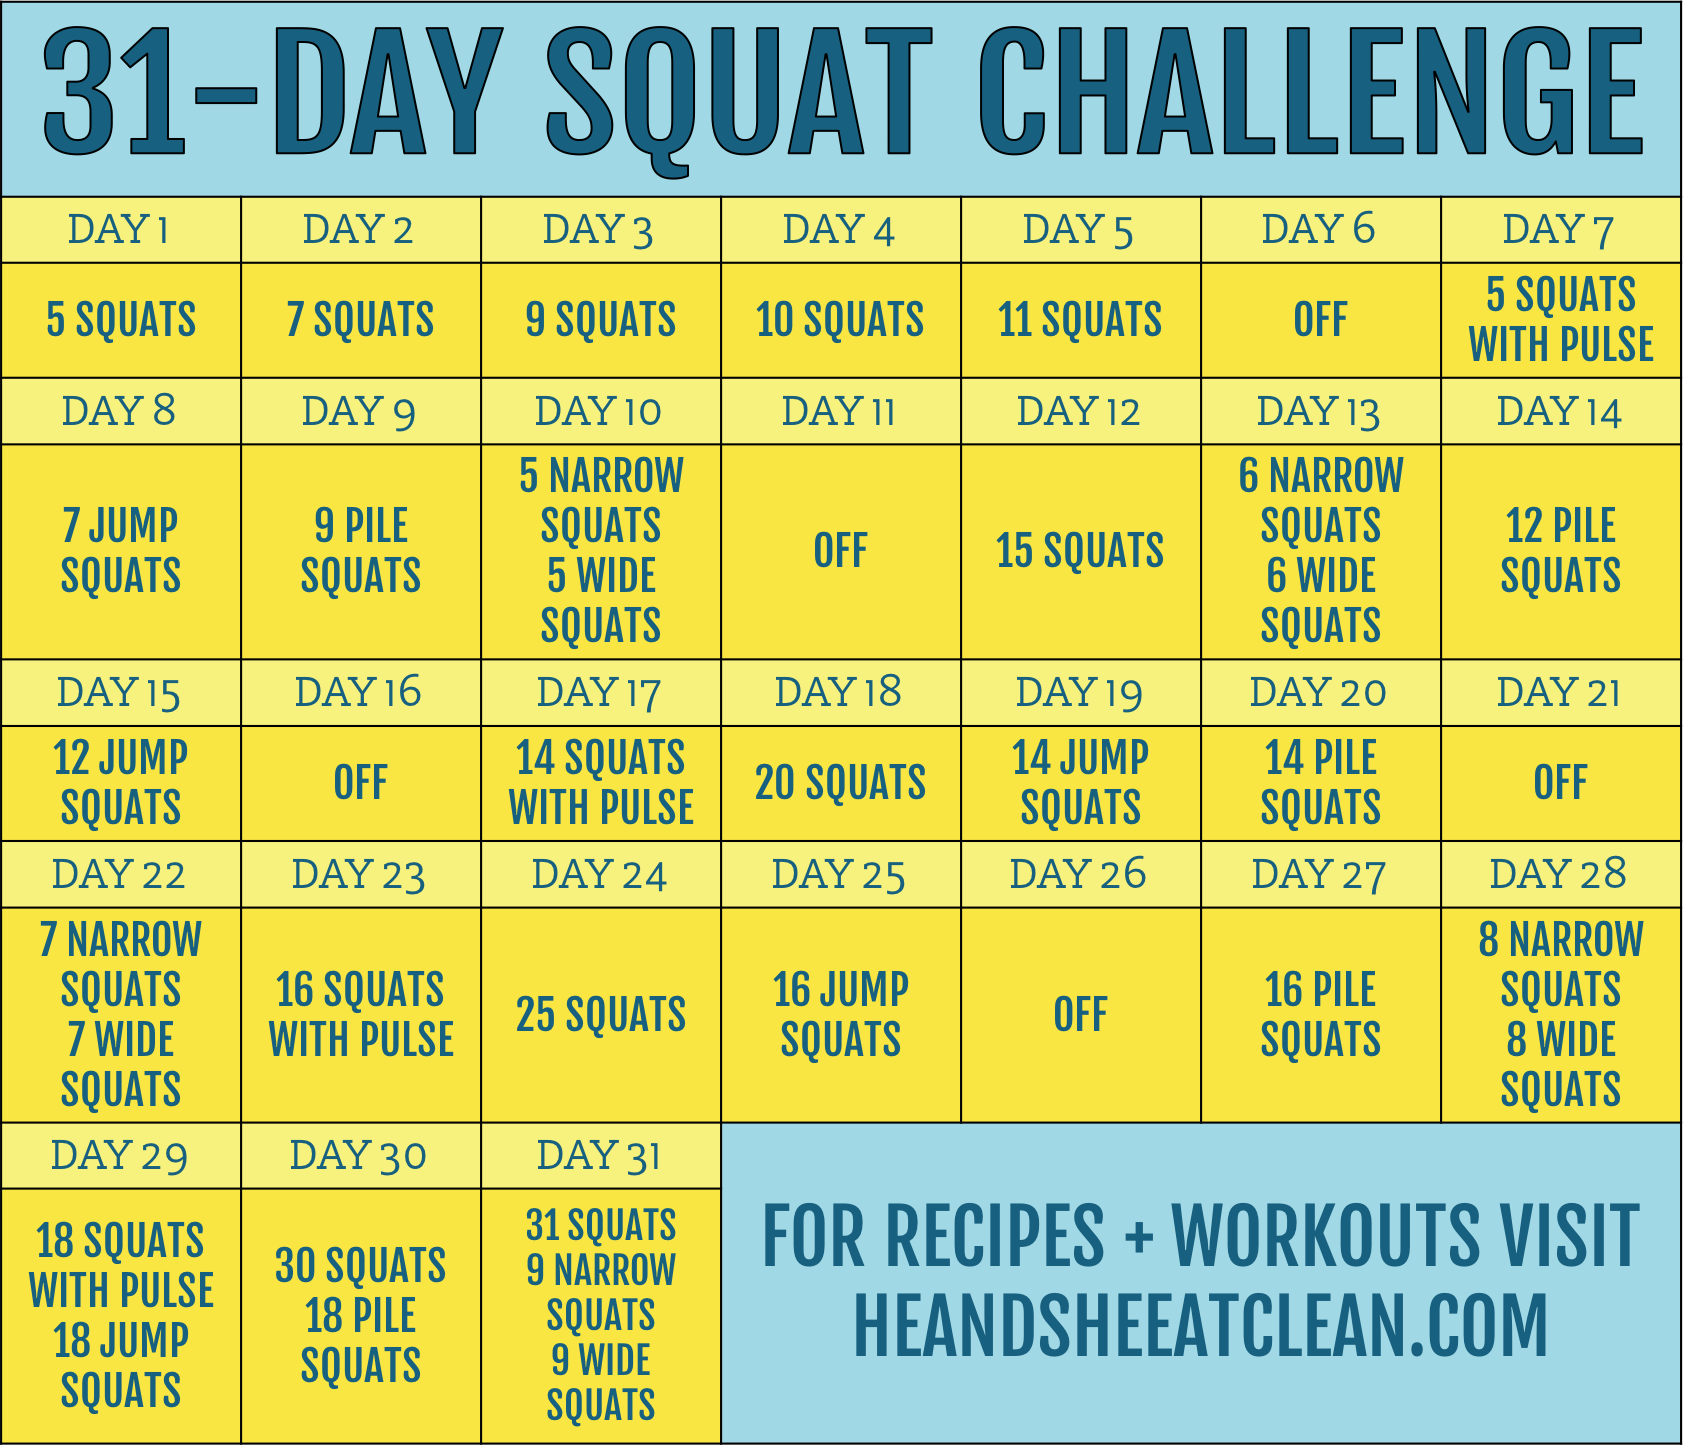 31-Day Squat Challenge